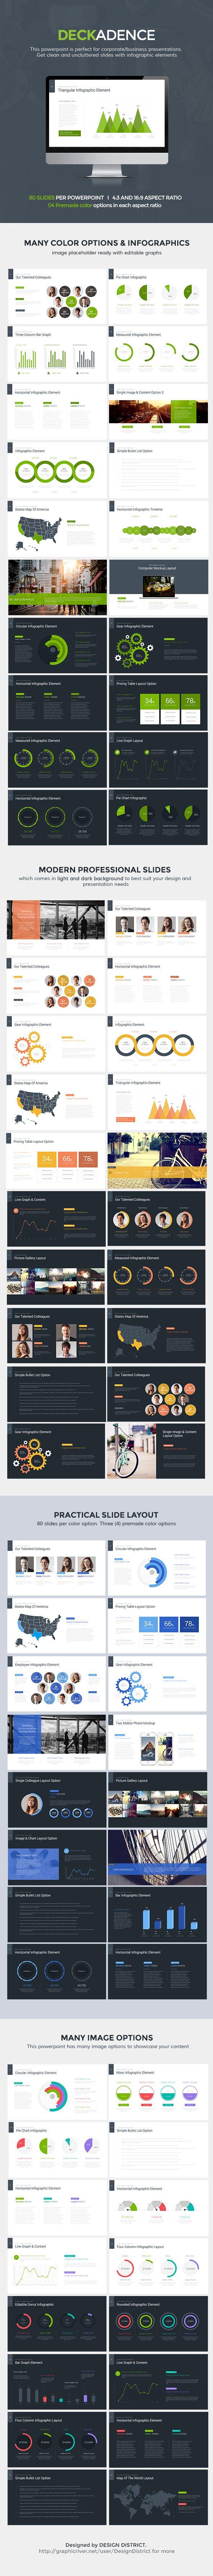 Decker Powerpoint Template PowerPoint Template / Theme / Presentation / Slides / Background / Power Point #powerpoint #template #theme